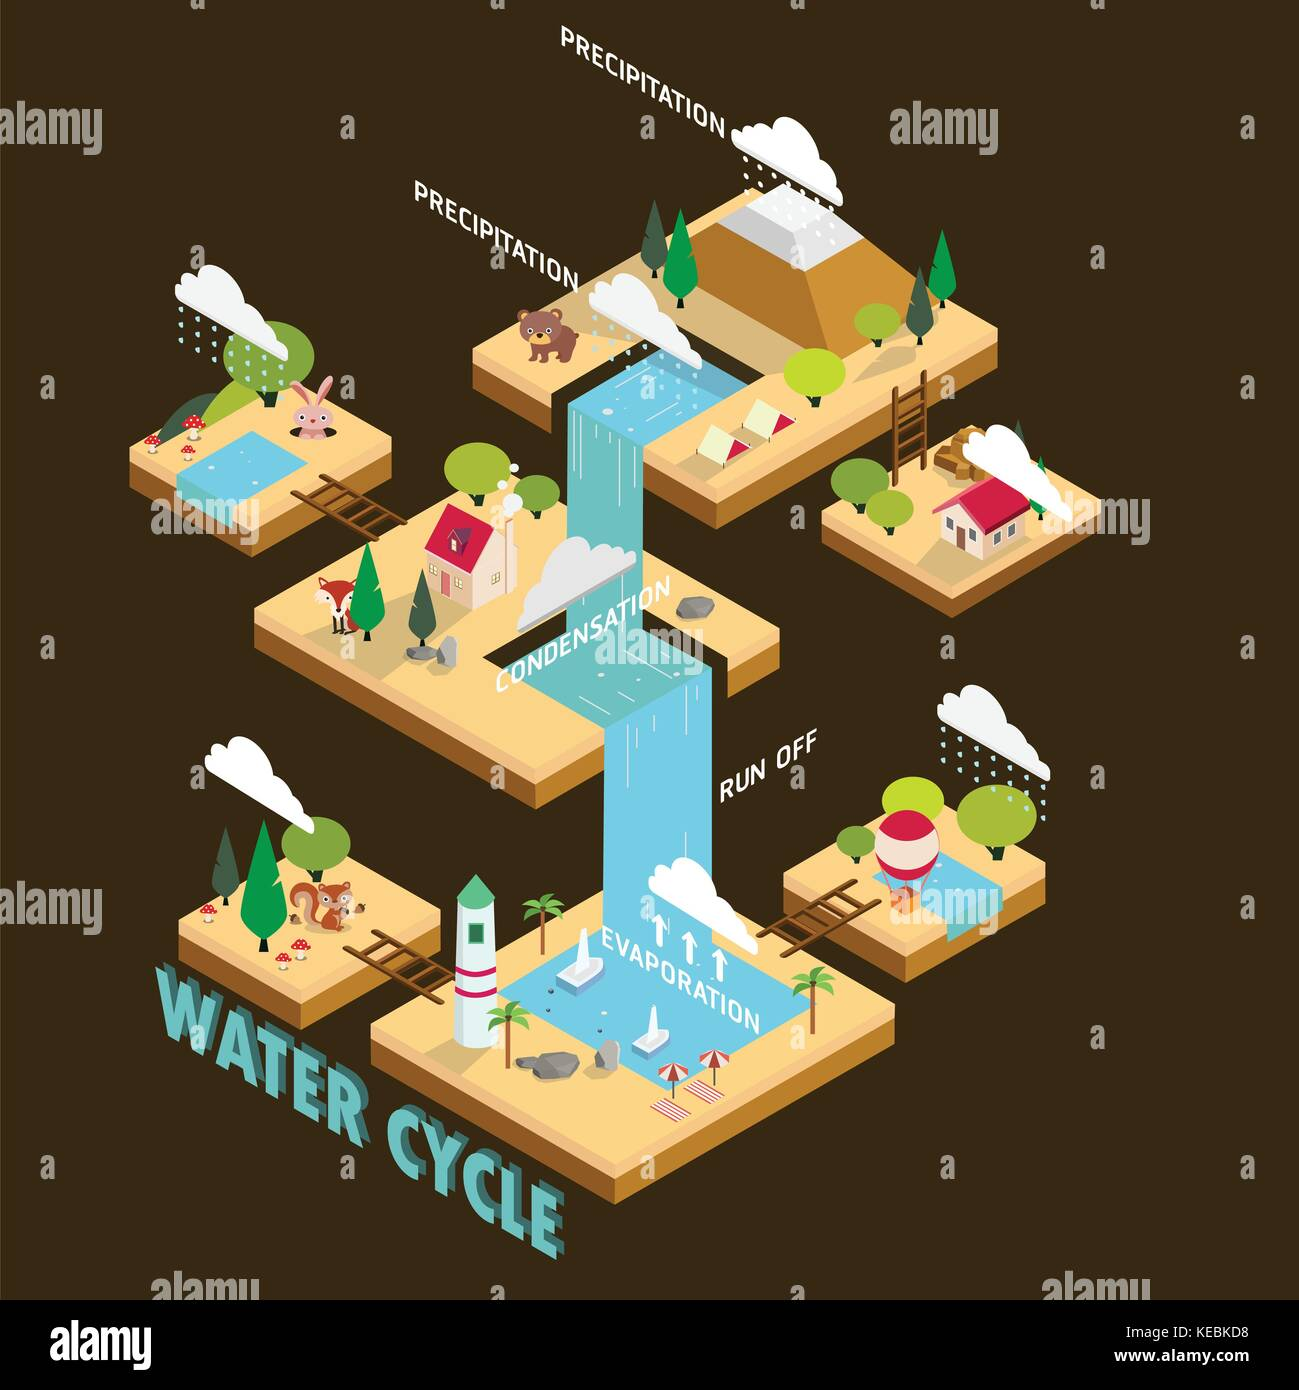 Water    Cycle       Diagram    Stock Photos   Water    Cycle       Diagram